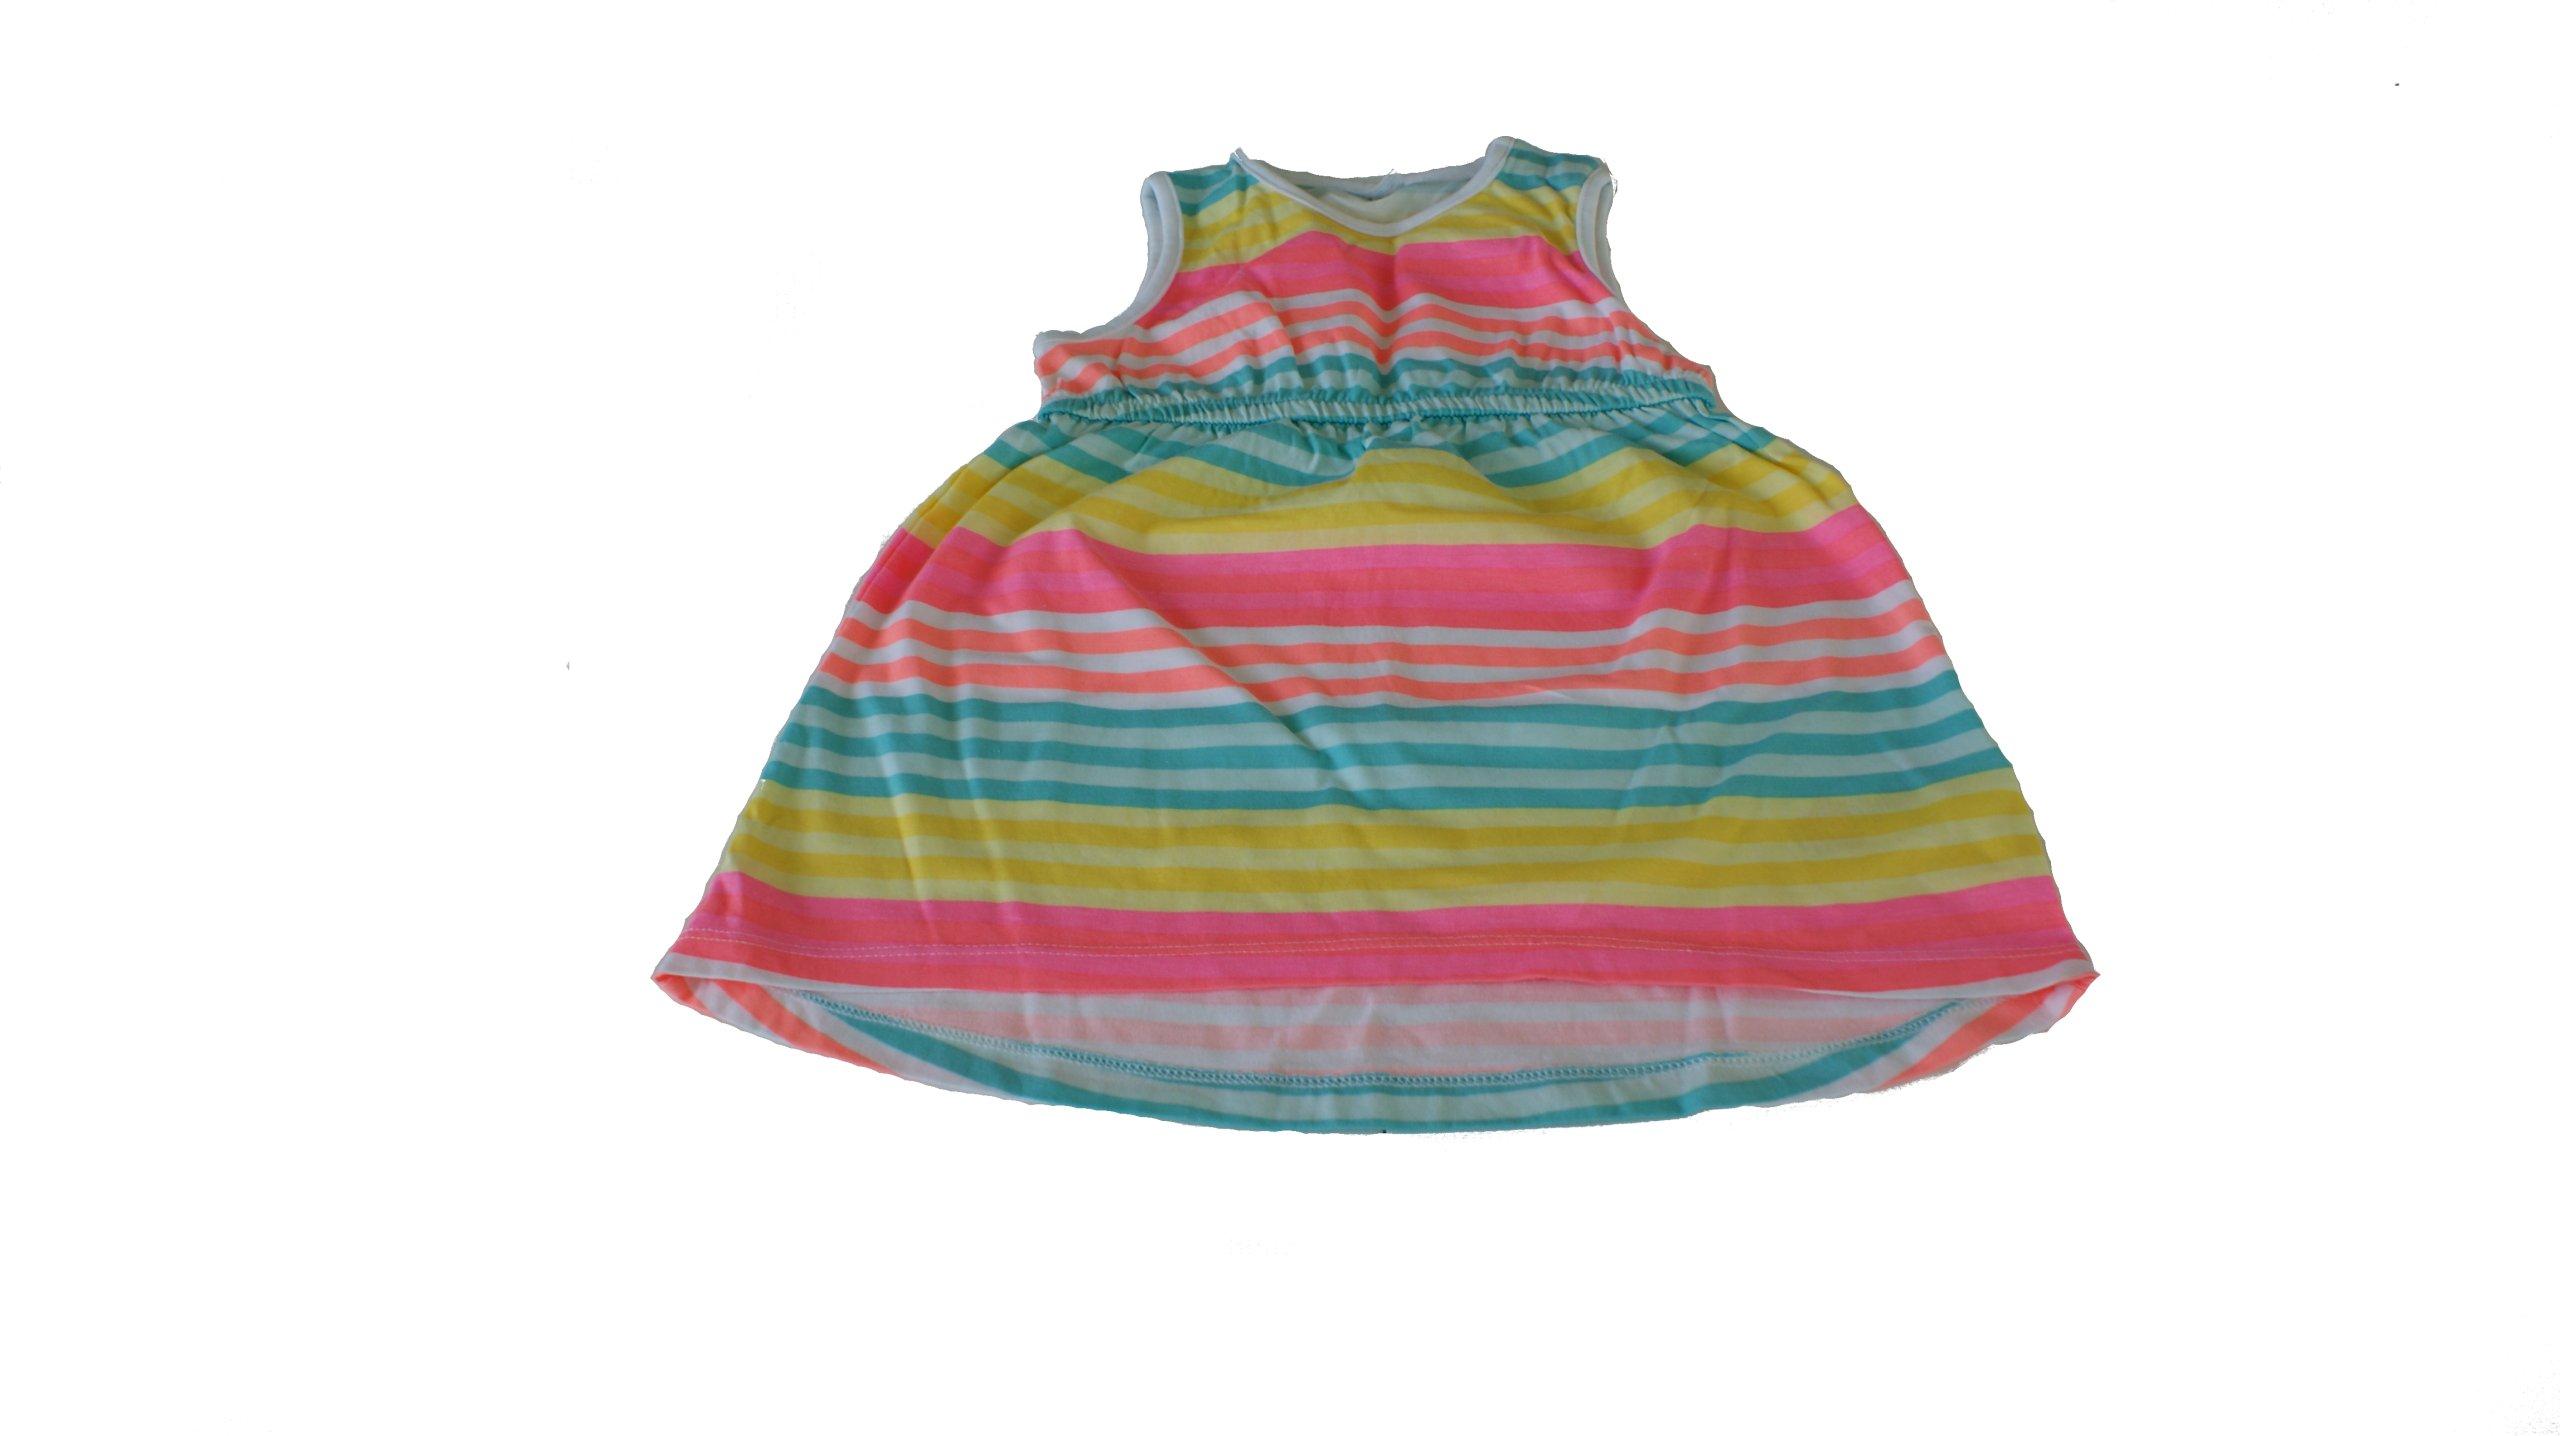 0d4abdb8ae Sukienka dla dziewczynki 74cm (6 9 m-ca) F F. - 7099870841 ...